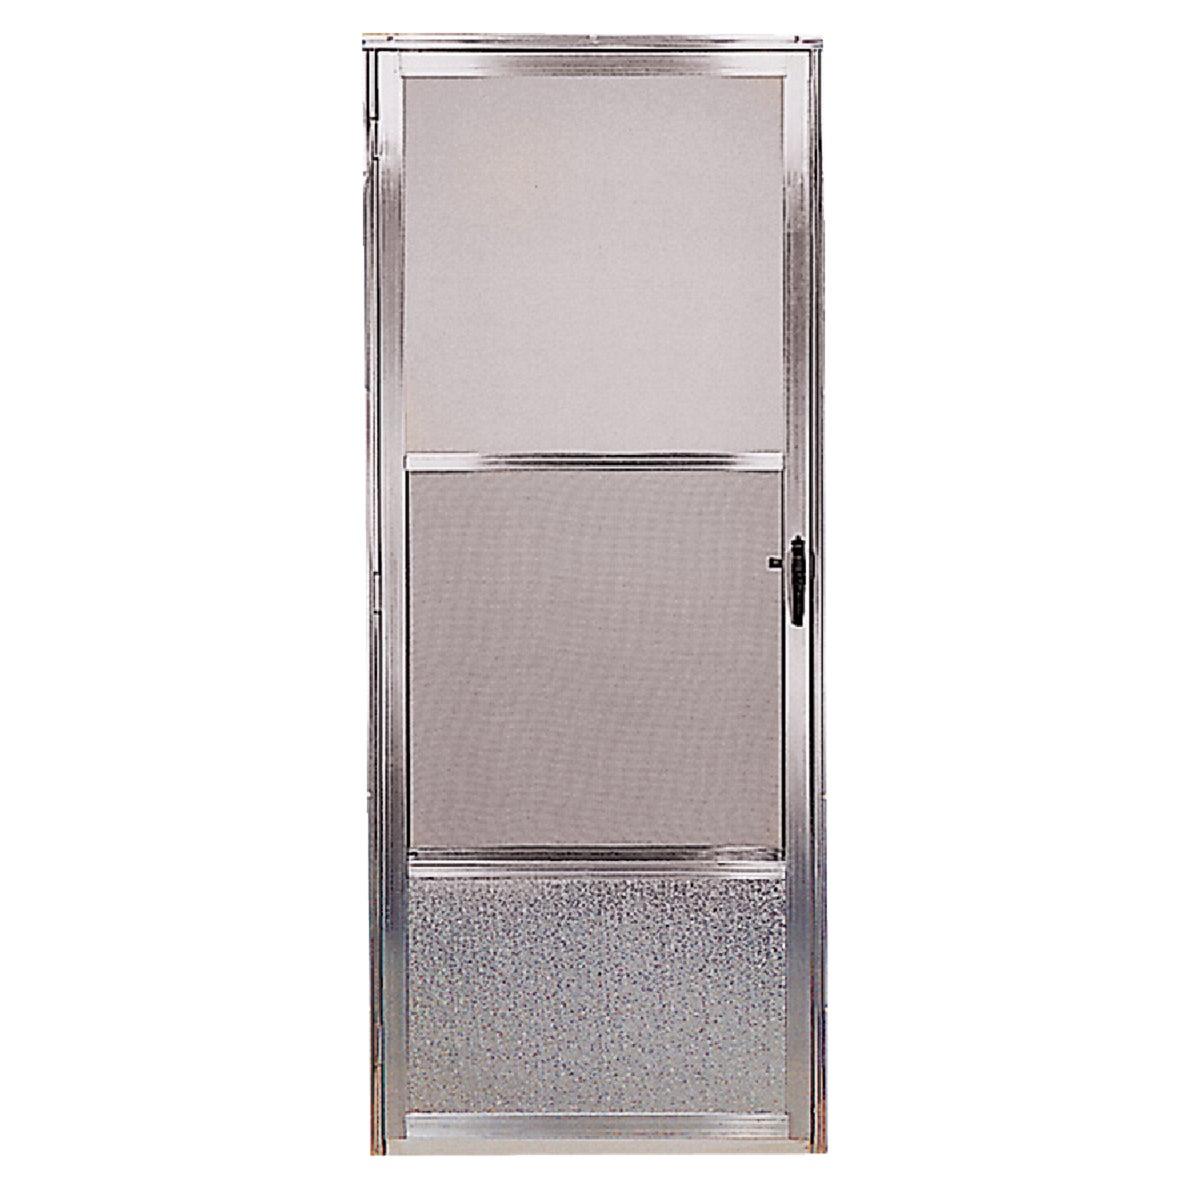 161 3068 RH MILL DOOR - F05747 by Croft Llc